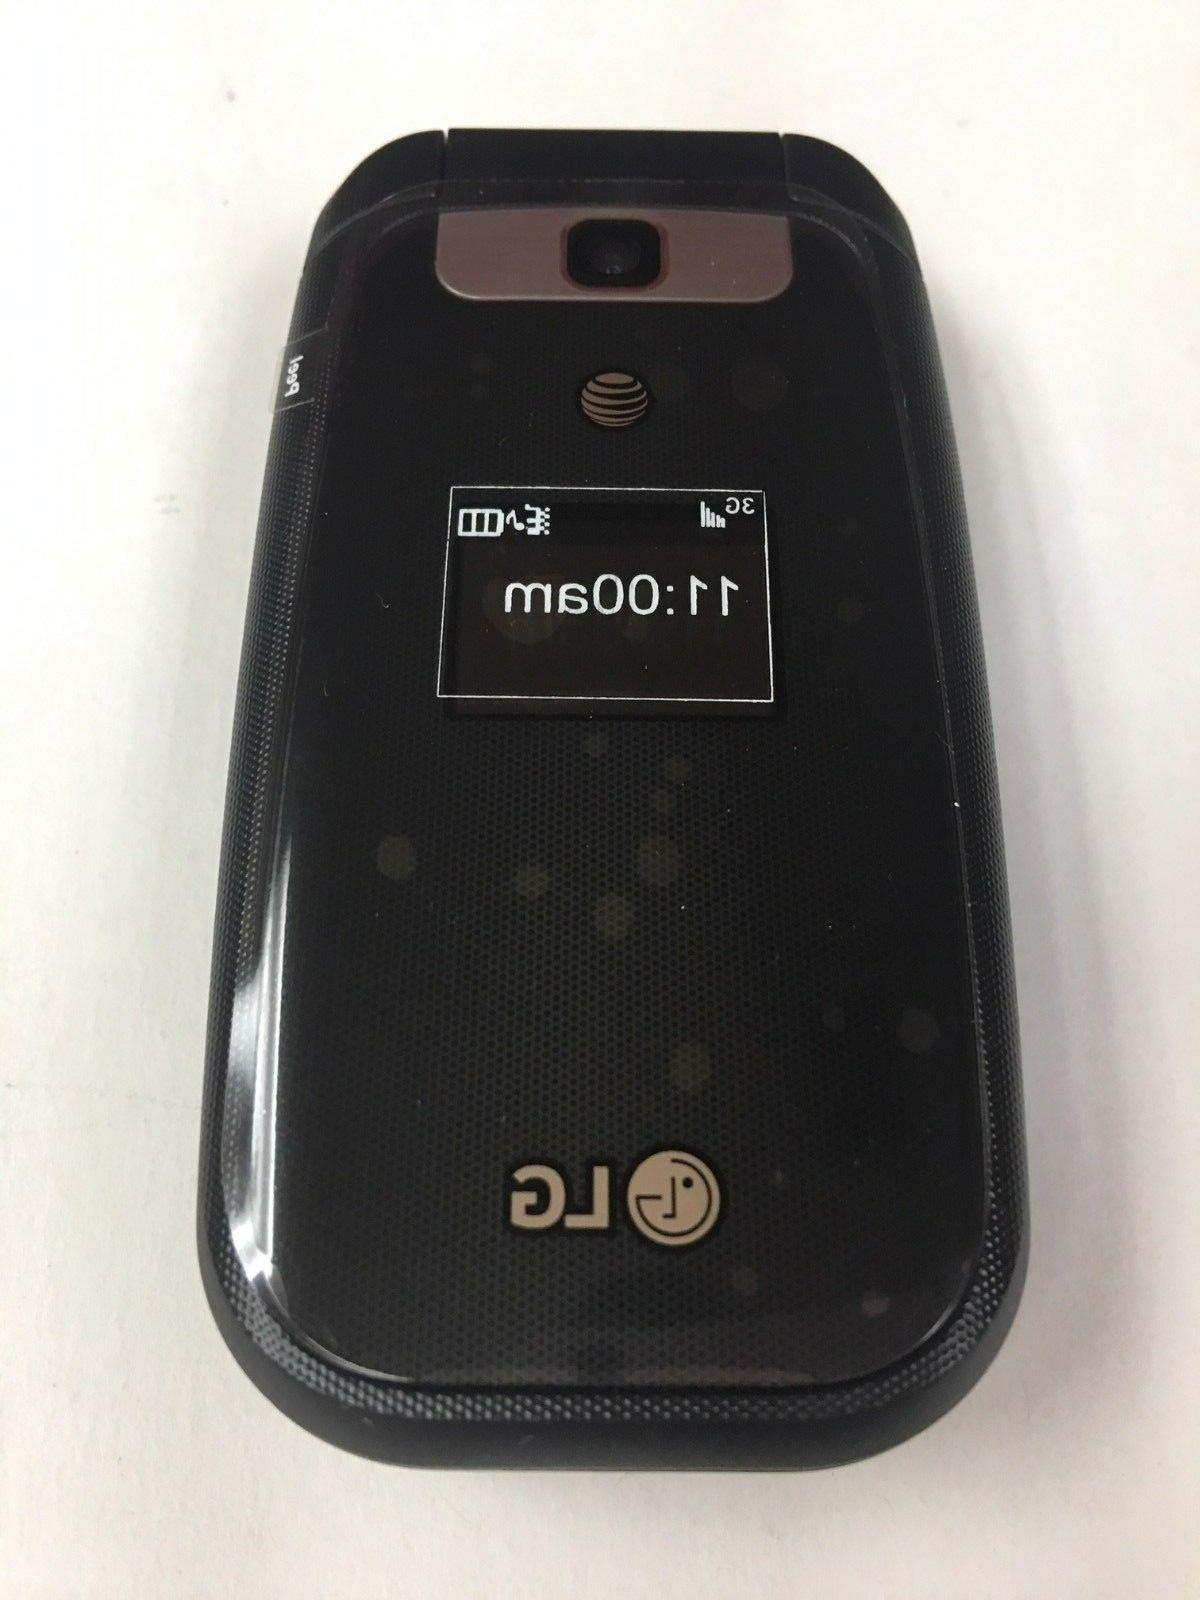 New LG AT&T Unlocked GSM Camera Flip Phone